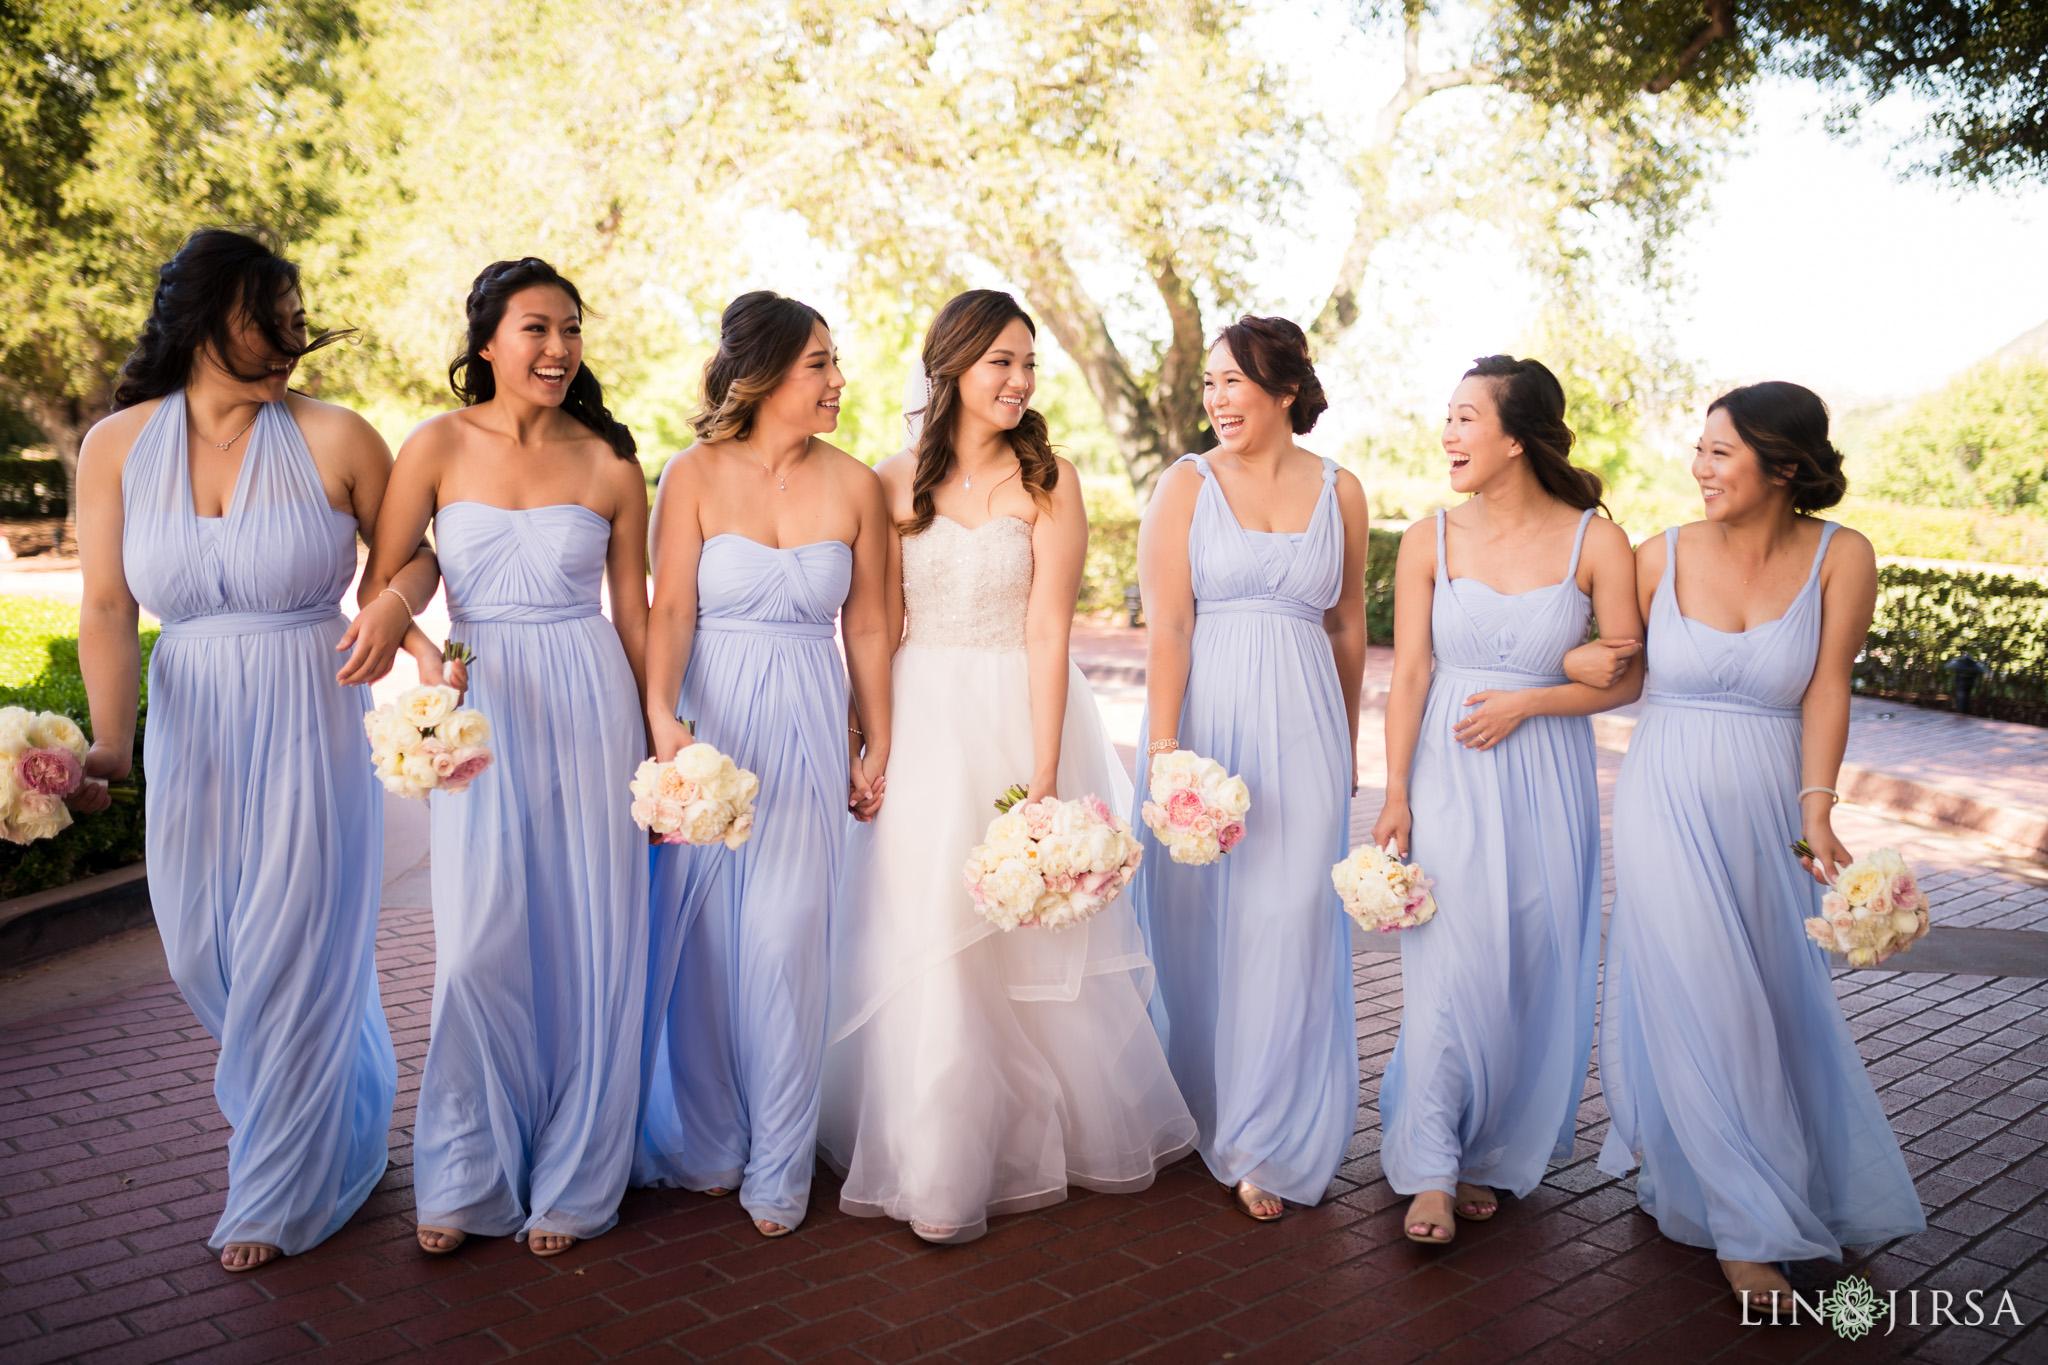 007 sherwood country club ventura county bridesmaids wedding photography